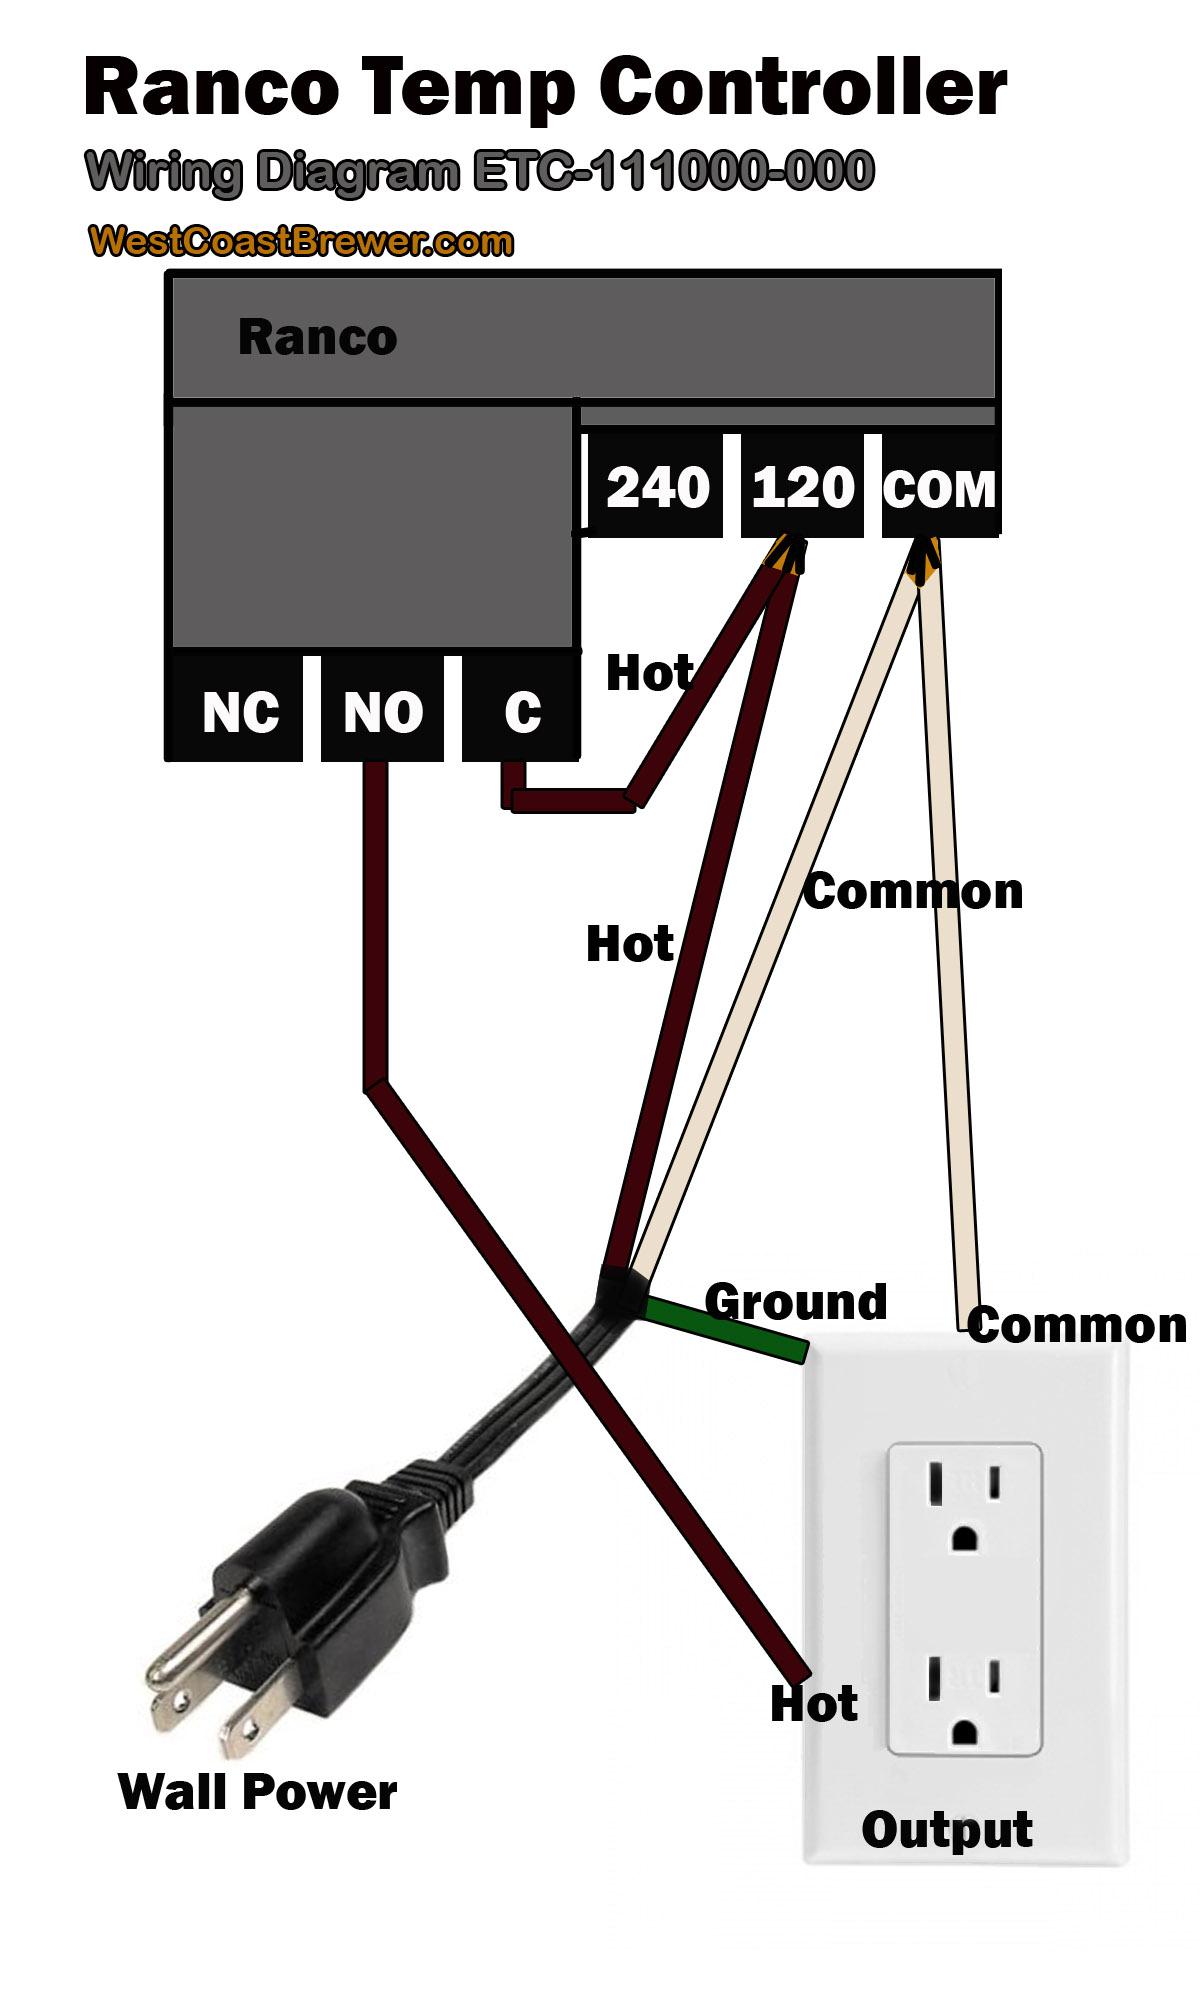 Ranco Digital Temperature Controller Wiring Diagram?resize=665%2C1108&ssl=1 120v wiring diagram the best wiring diagram 2017 Transducer Wiring-Diagram at virtualis.co